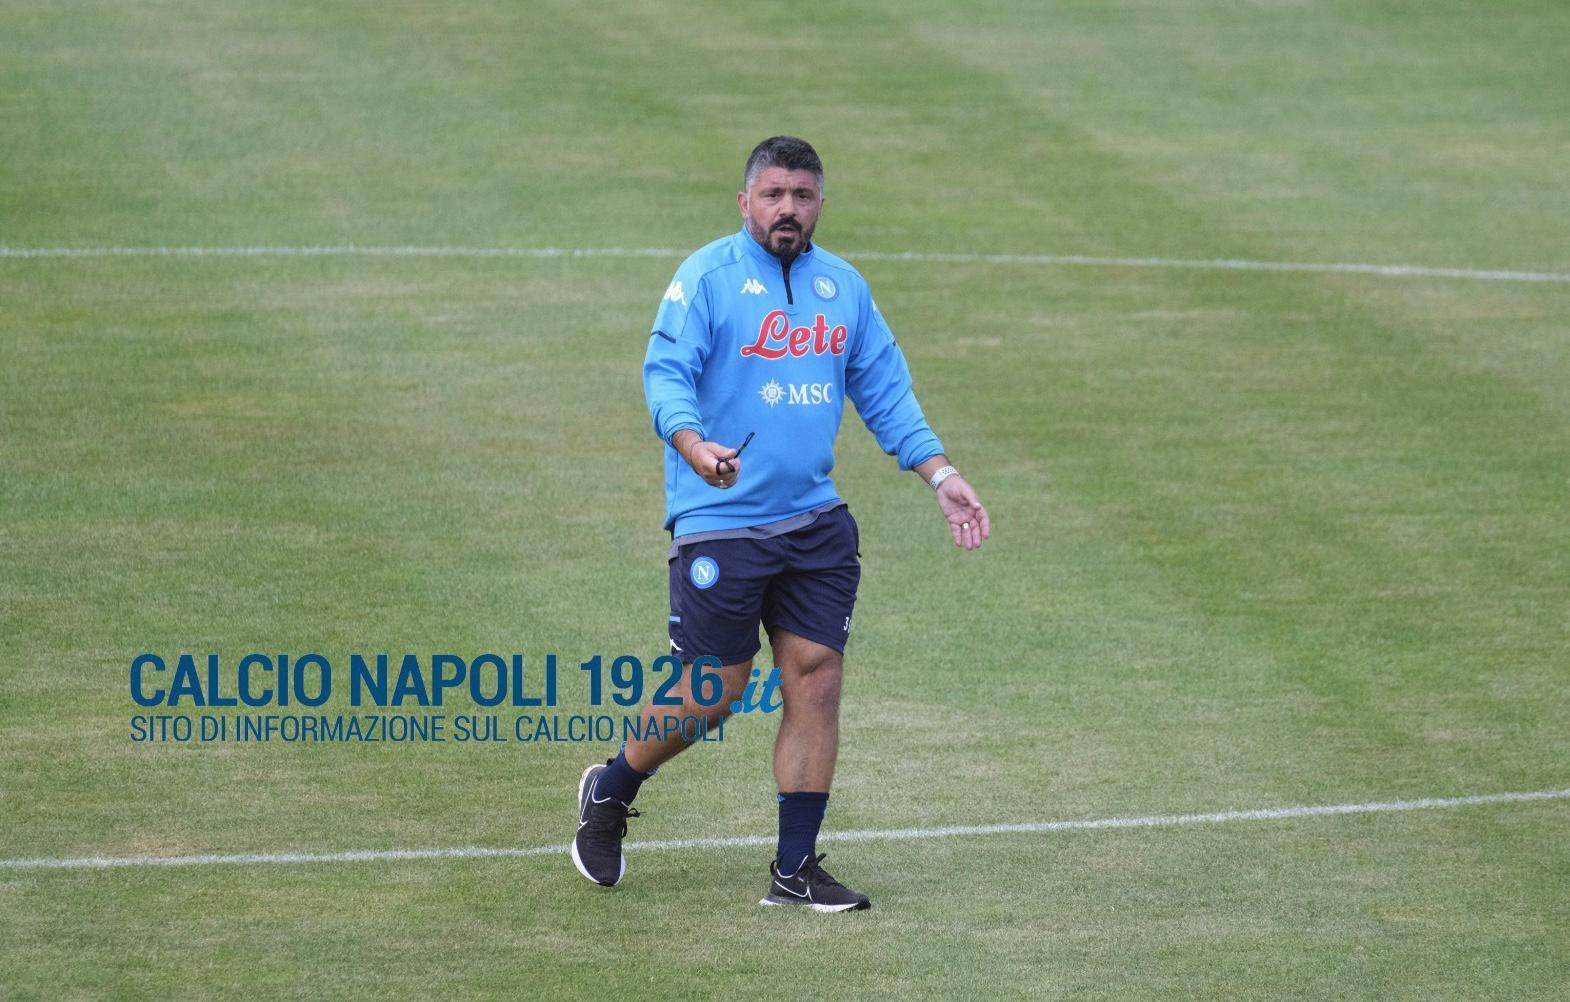 Sky - Sporting Lisbona-Napoli, spunta una richiesta dei partenopei